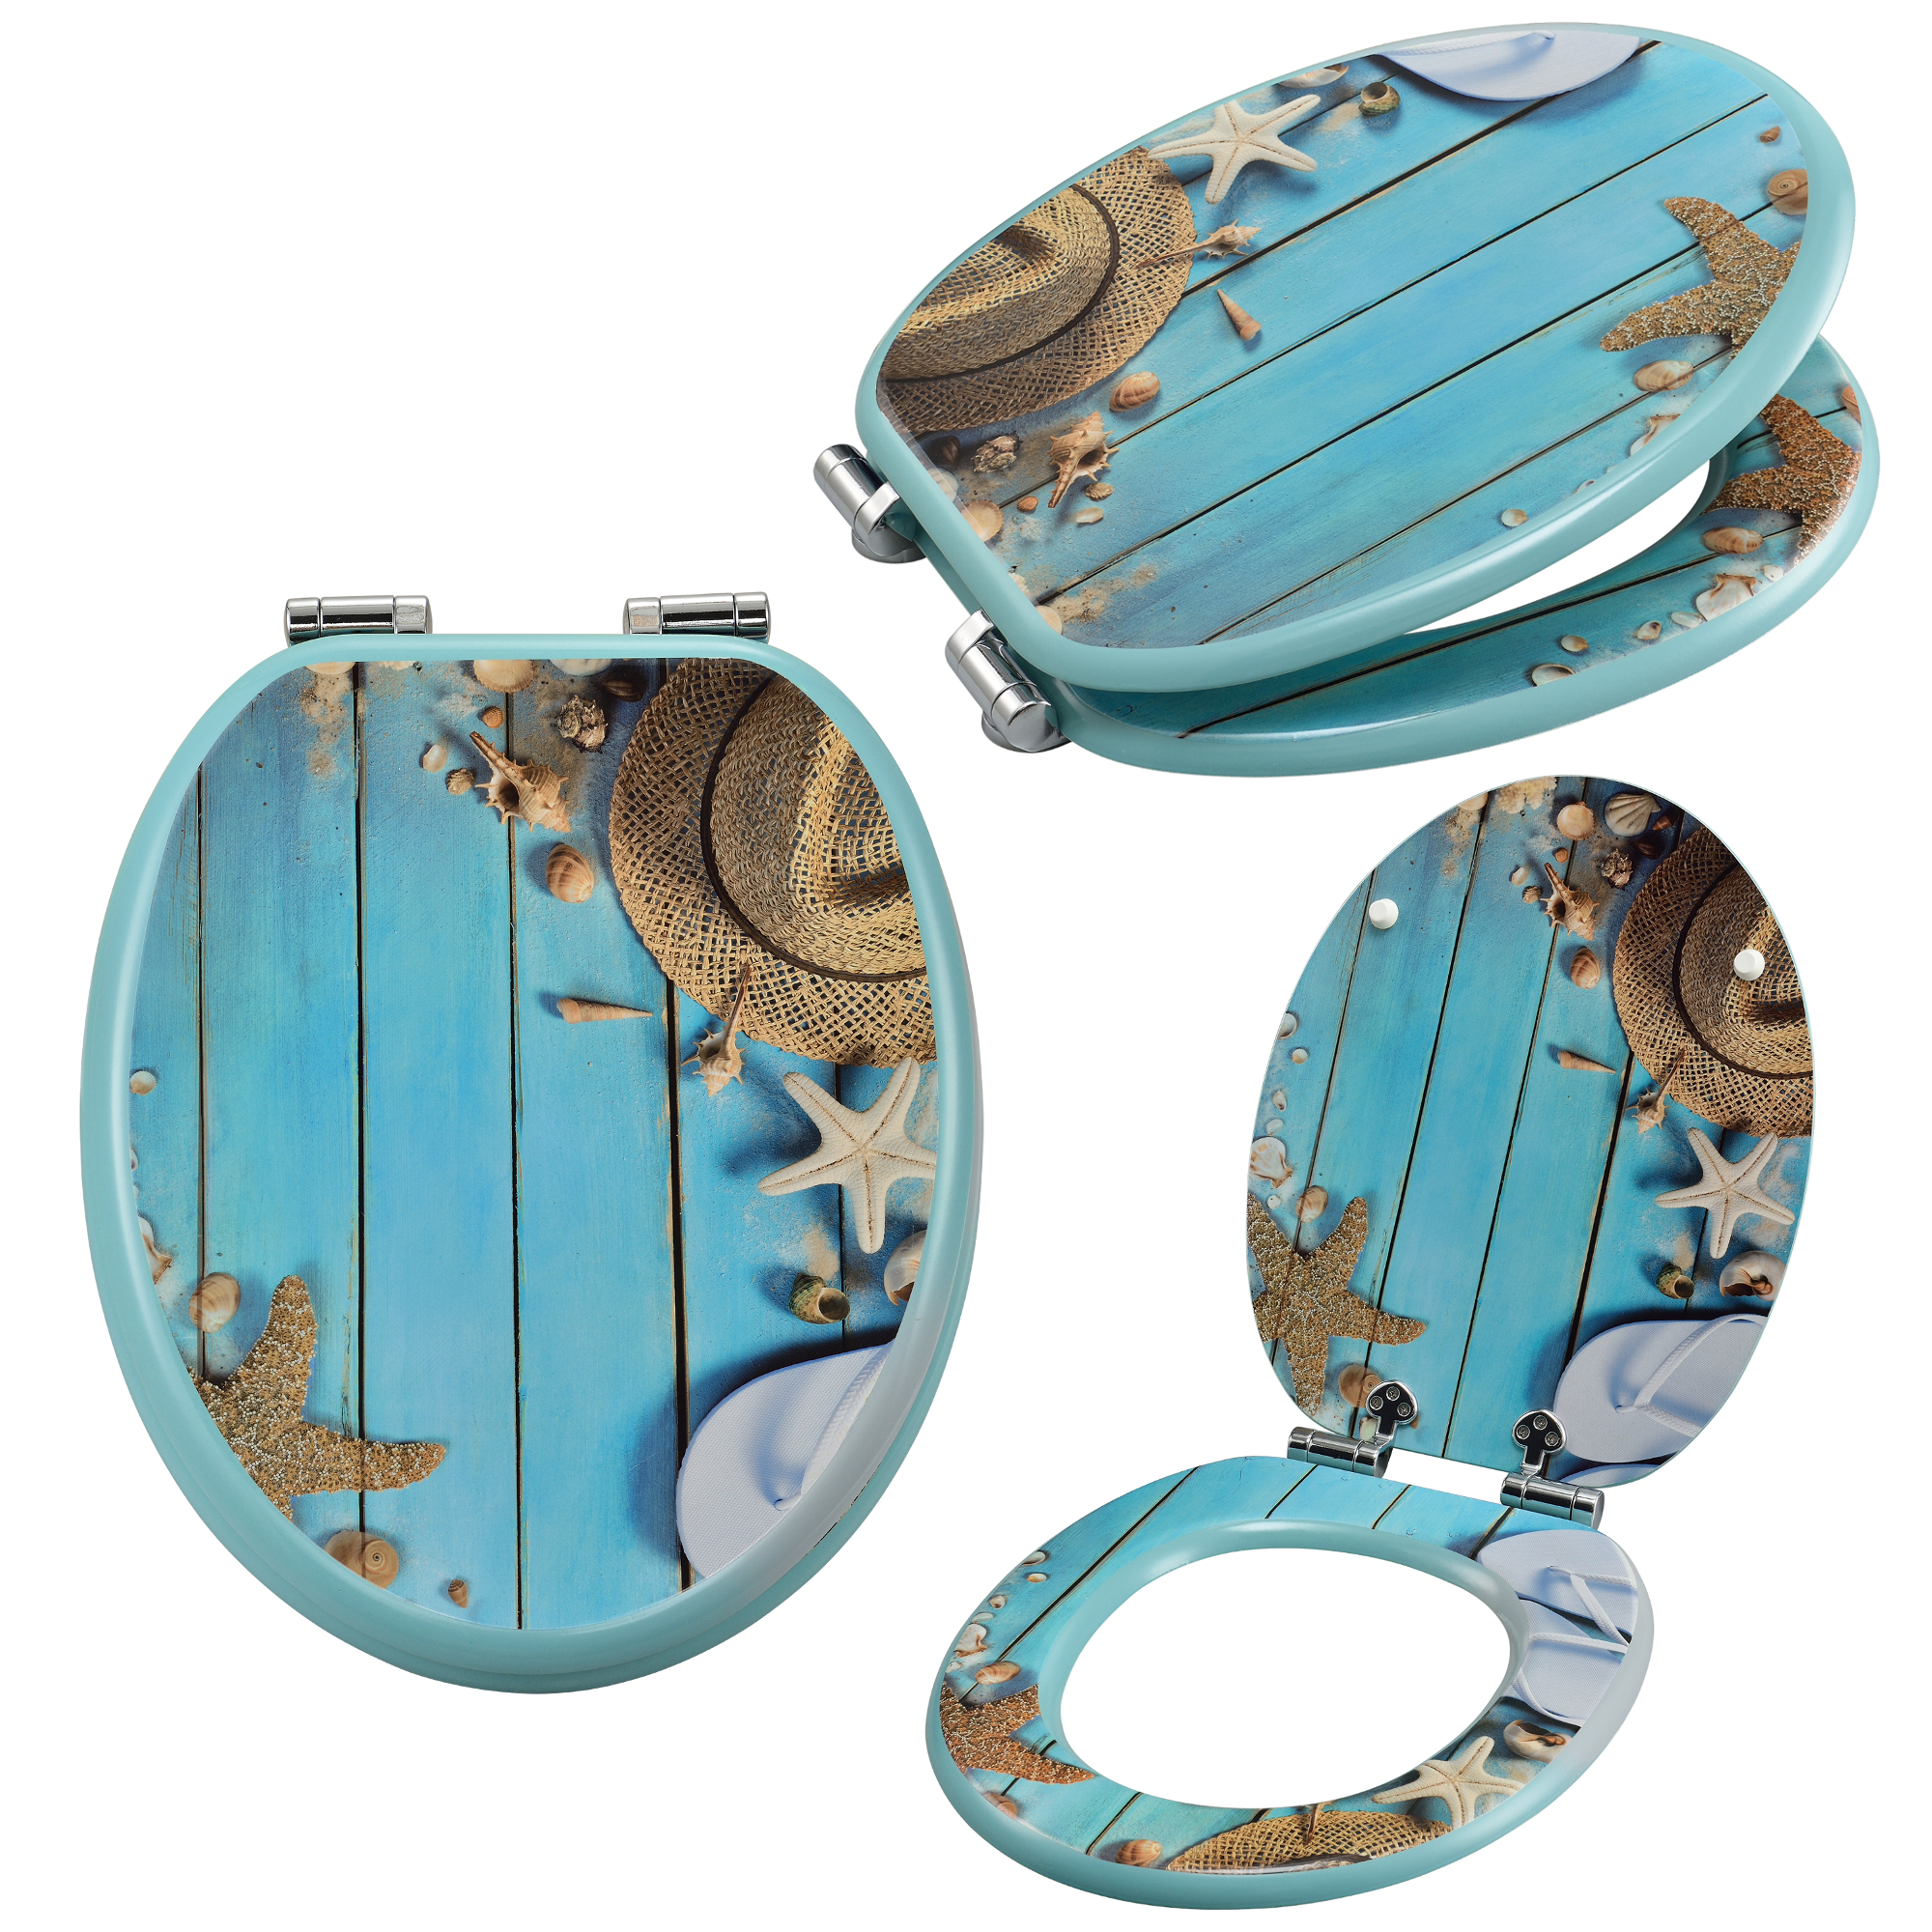 toilettensitz absenkautomatik wc sitz toilettendeckel klodeckel motiv ebay. Black Bedroom Furniture Sets. Home Design Ideas